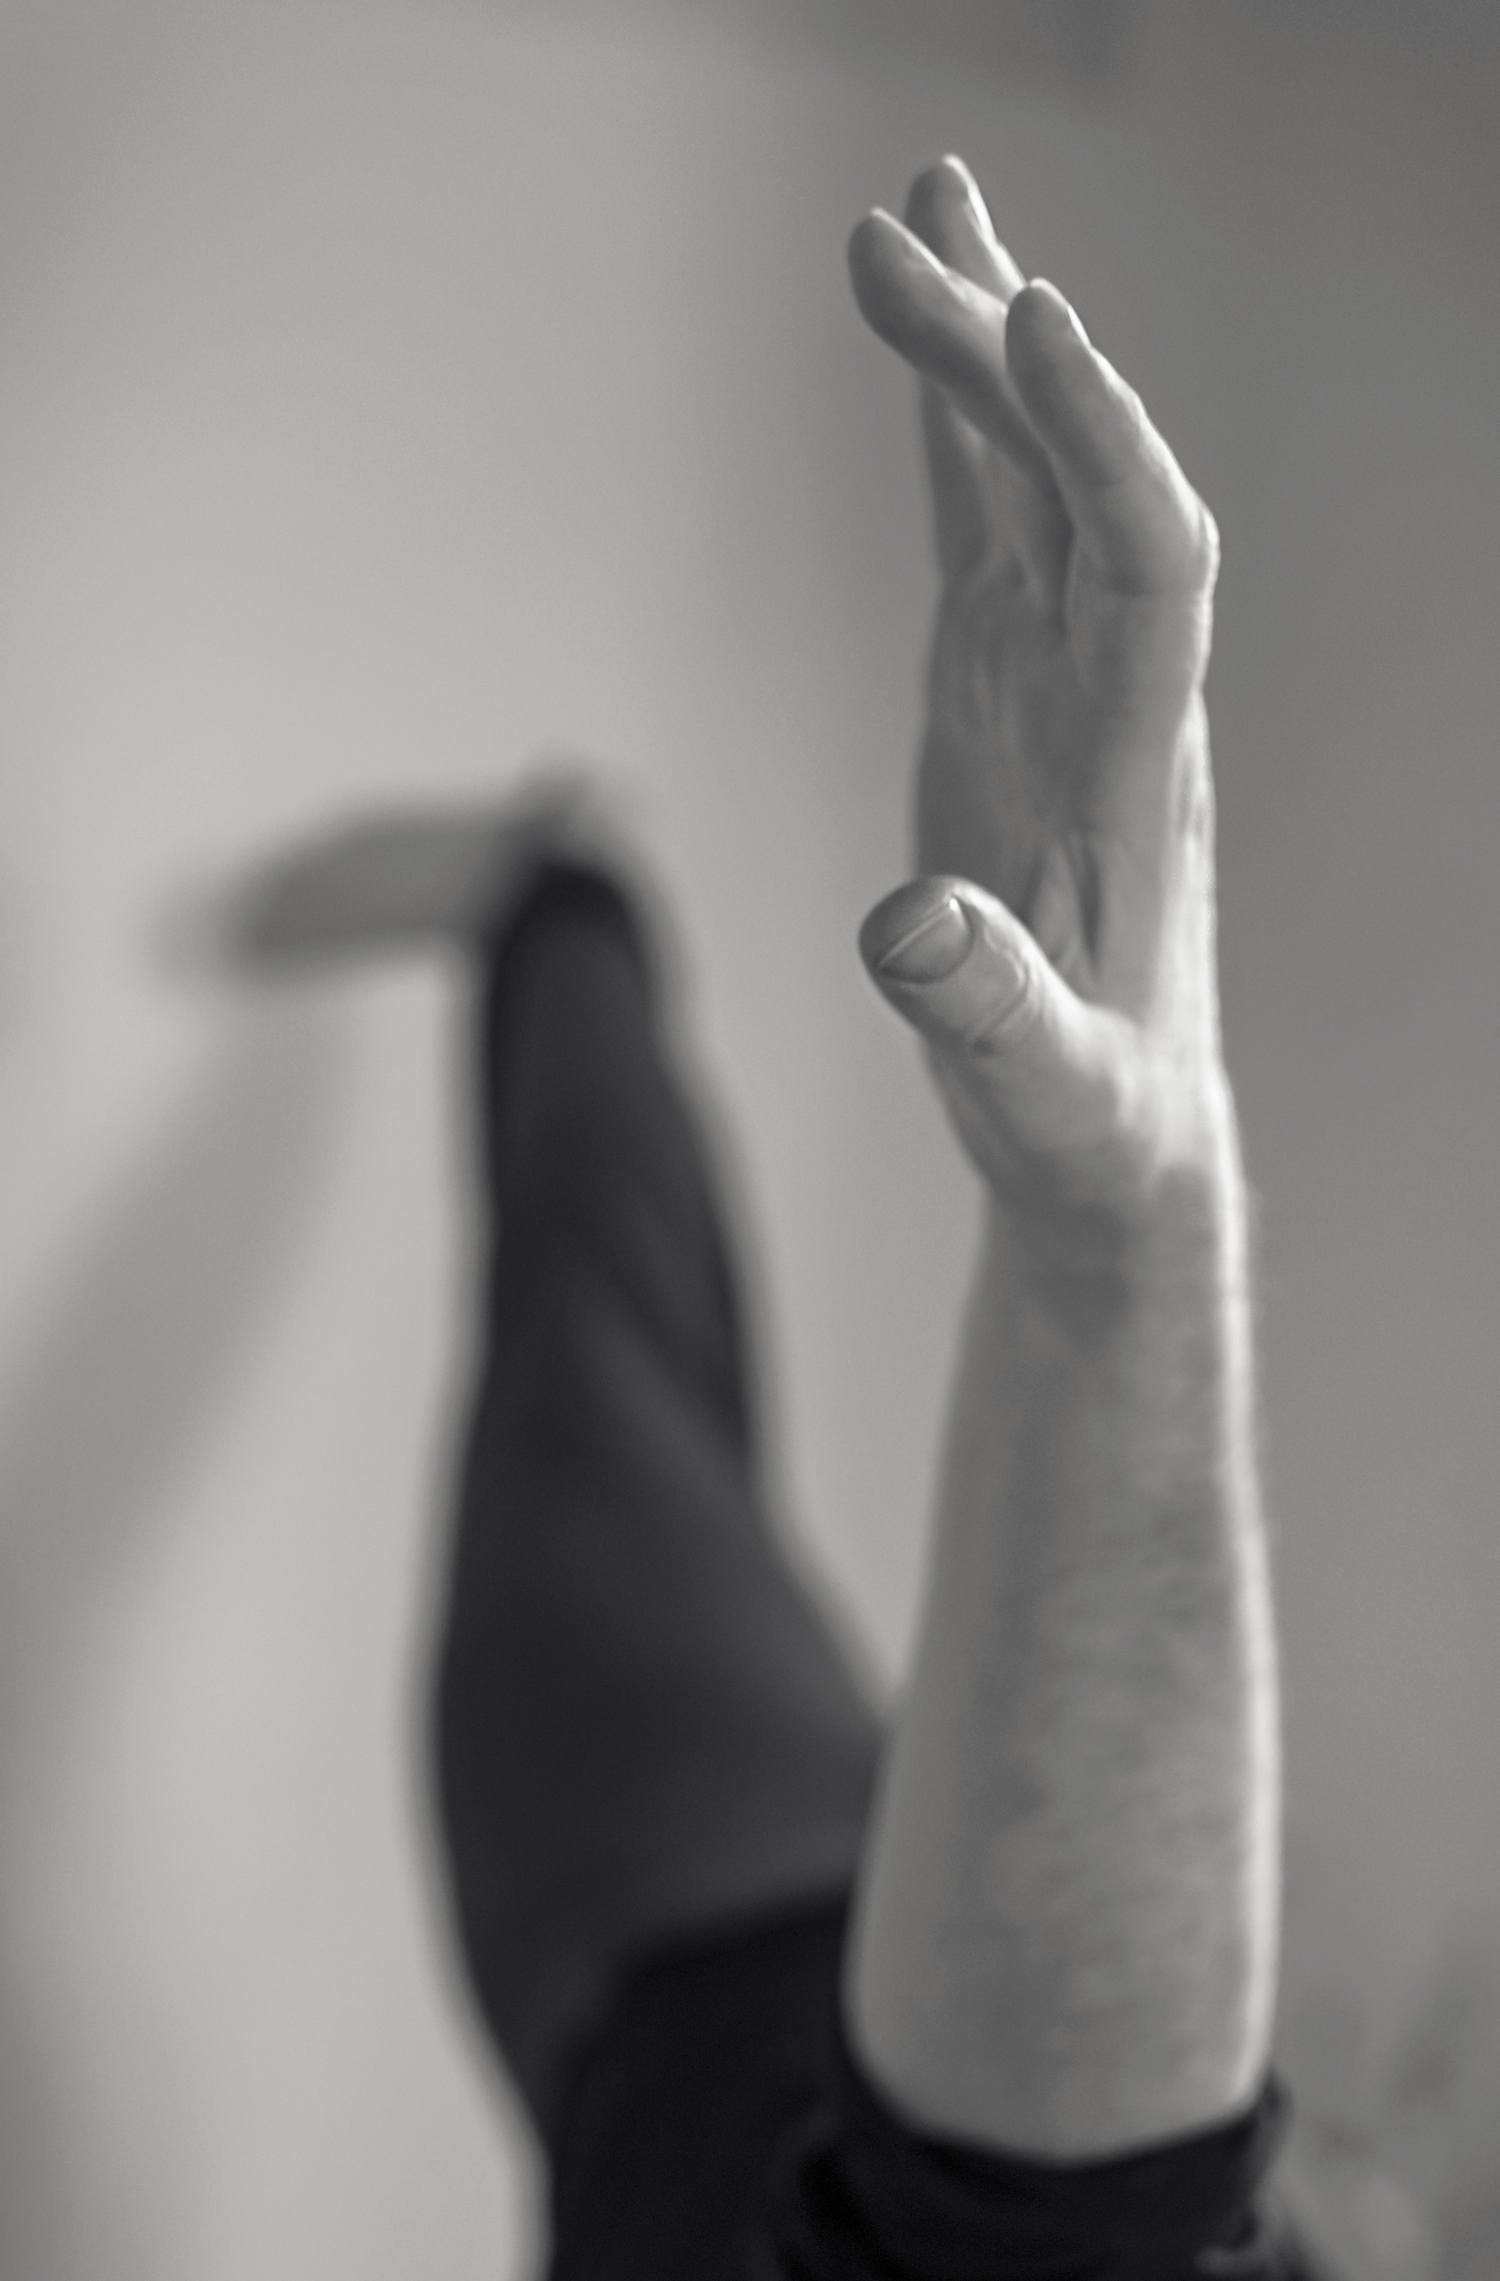 Fluid Yoga (root) — Florian Ulbricht